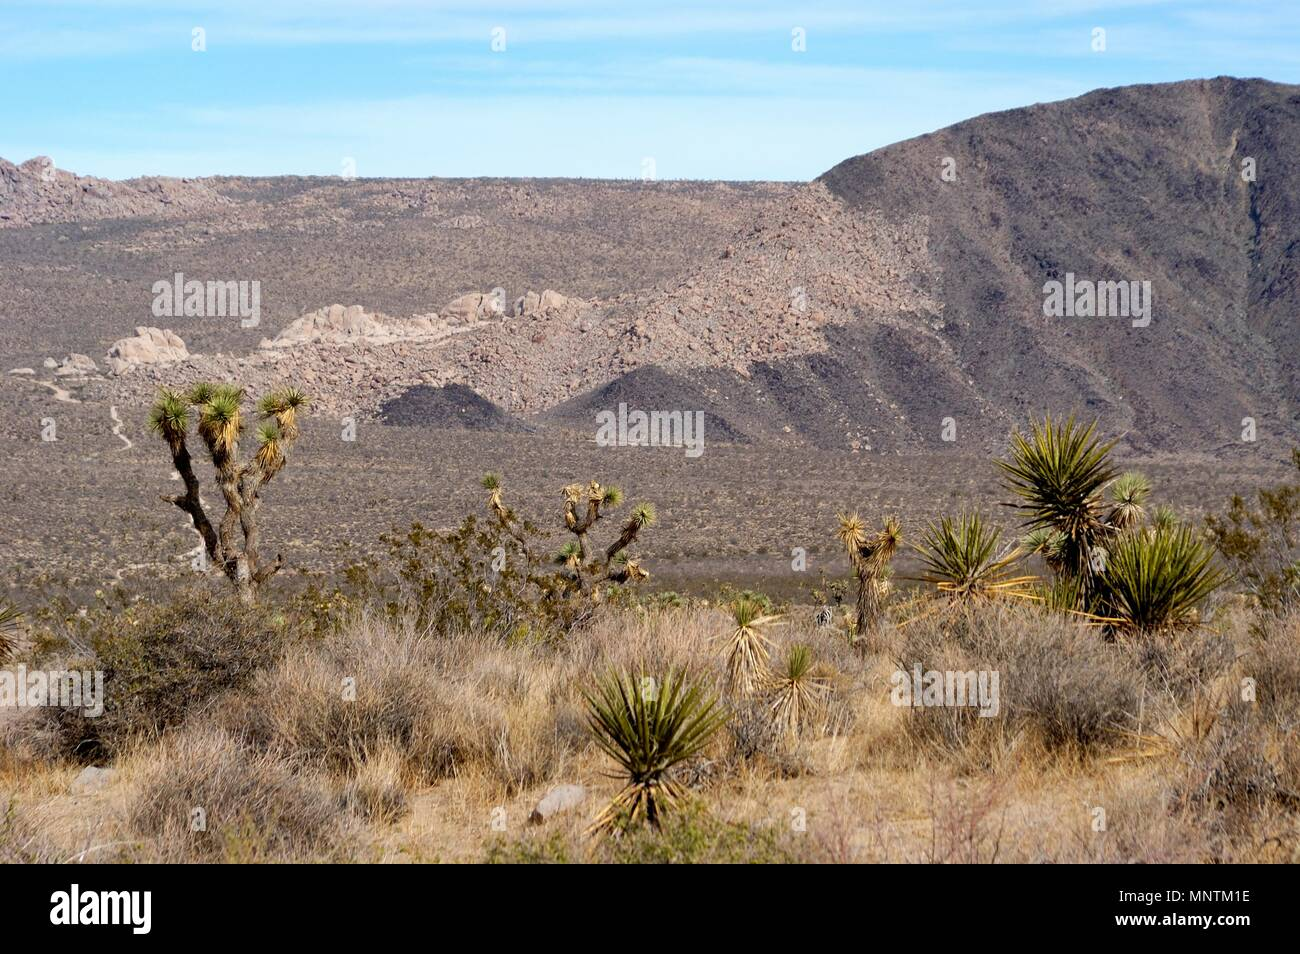 Joshua trees, Yucca brevifolia, Yucca palm, Mojave Yucca, Yucca shidigera, Monzogranite and Pinto Gneiss, across Pleasant Valley,  031129_0432 - Stock Image